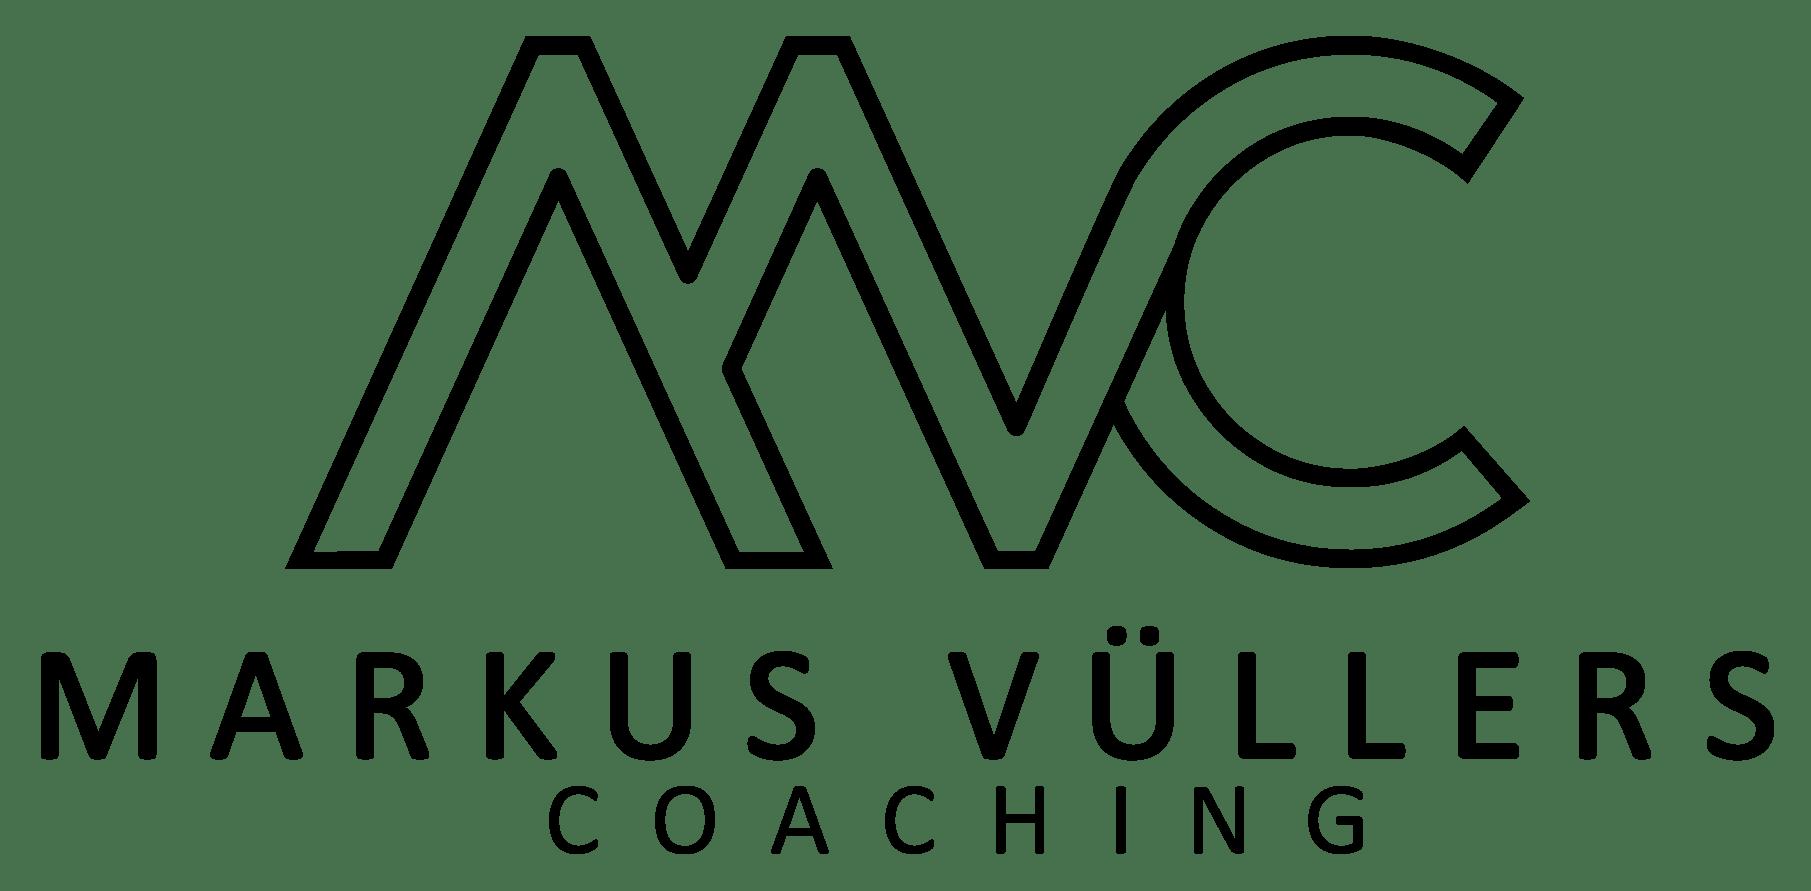 Markus Vüllers Coaching